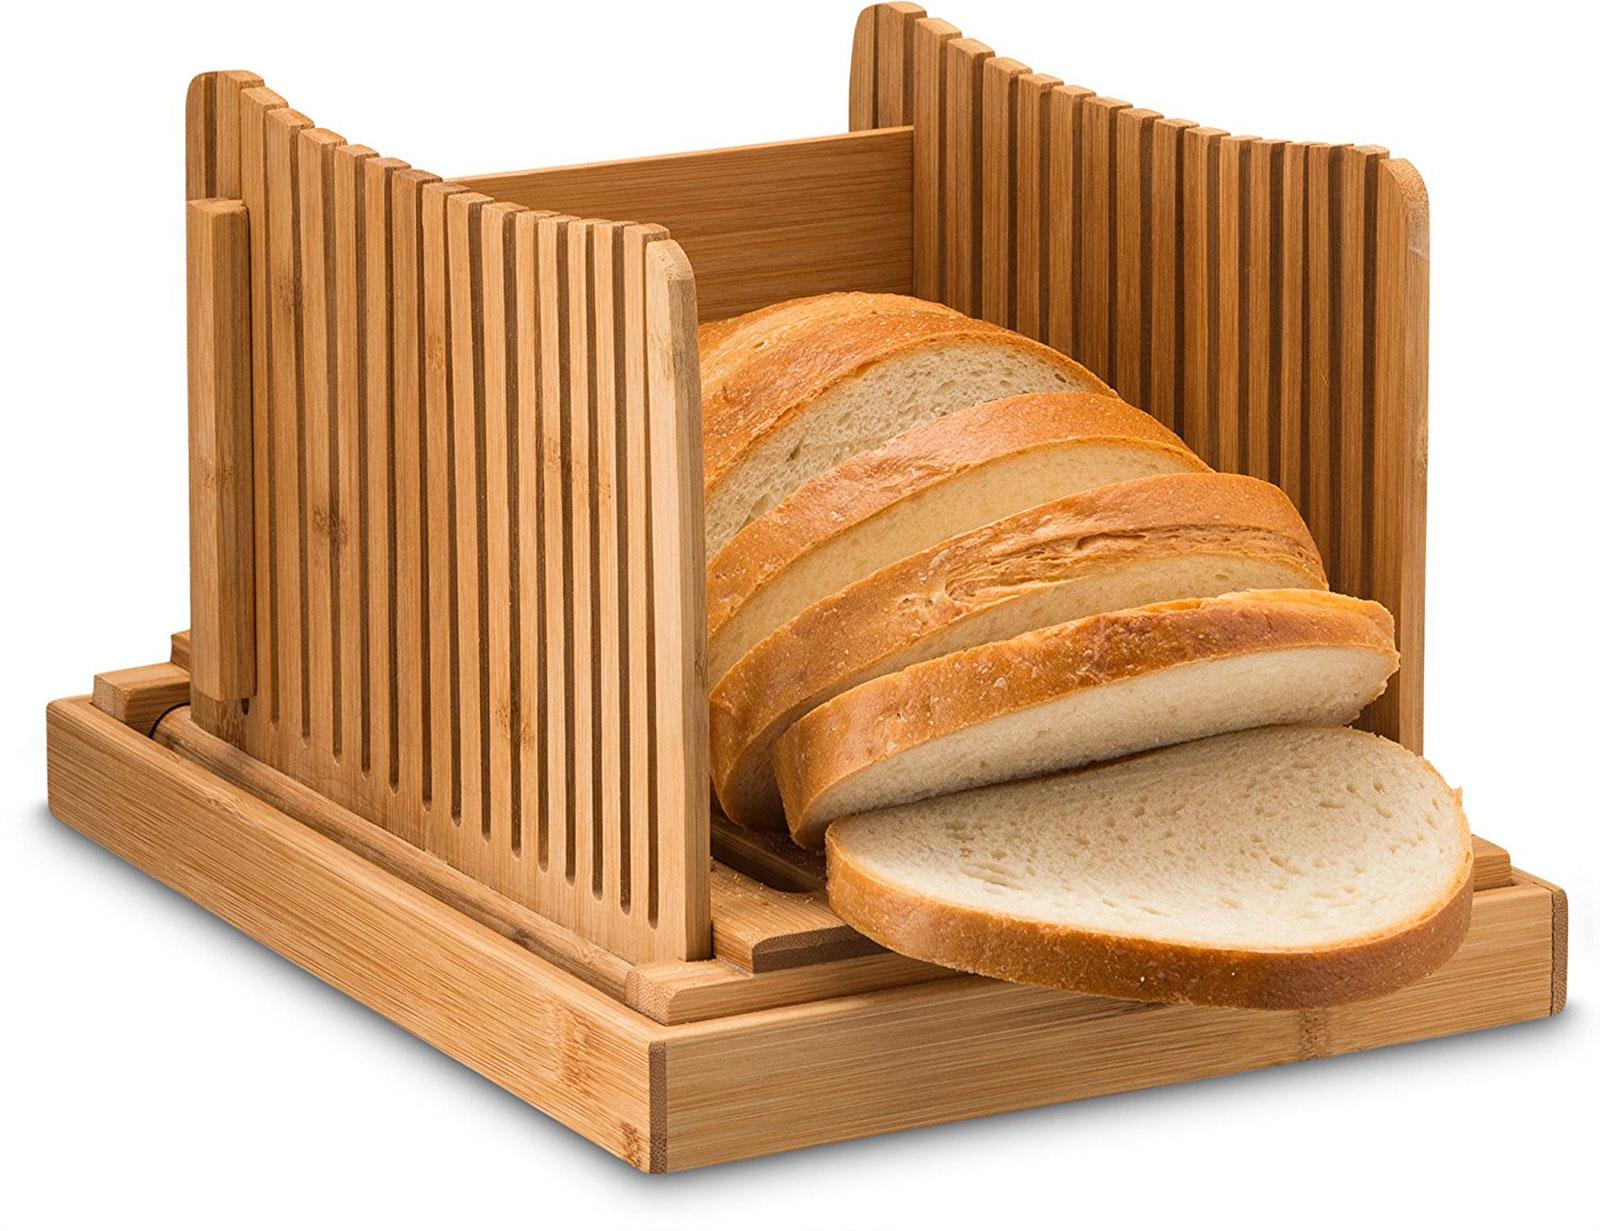 Belmint: Bambusi Bamboo Foldable Adjustable Bread Slicer w/ Crumb ...